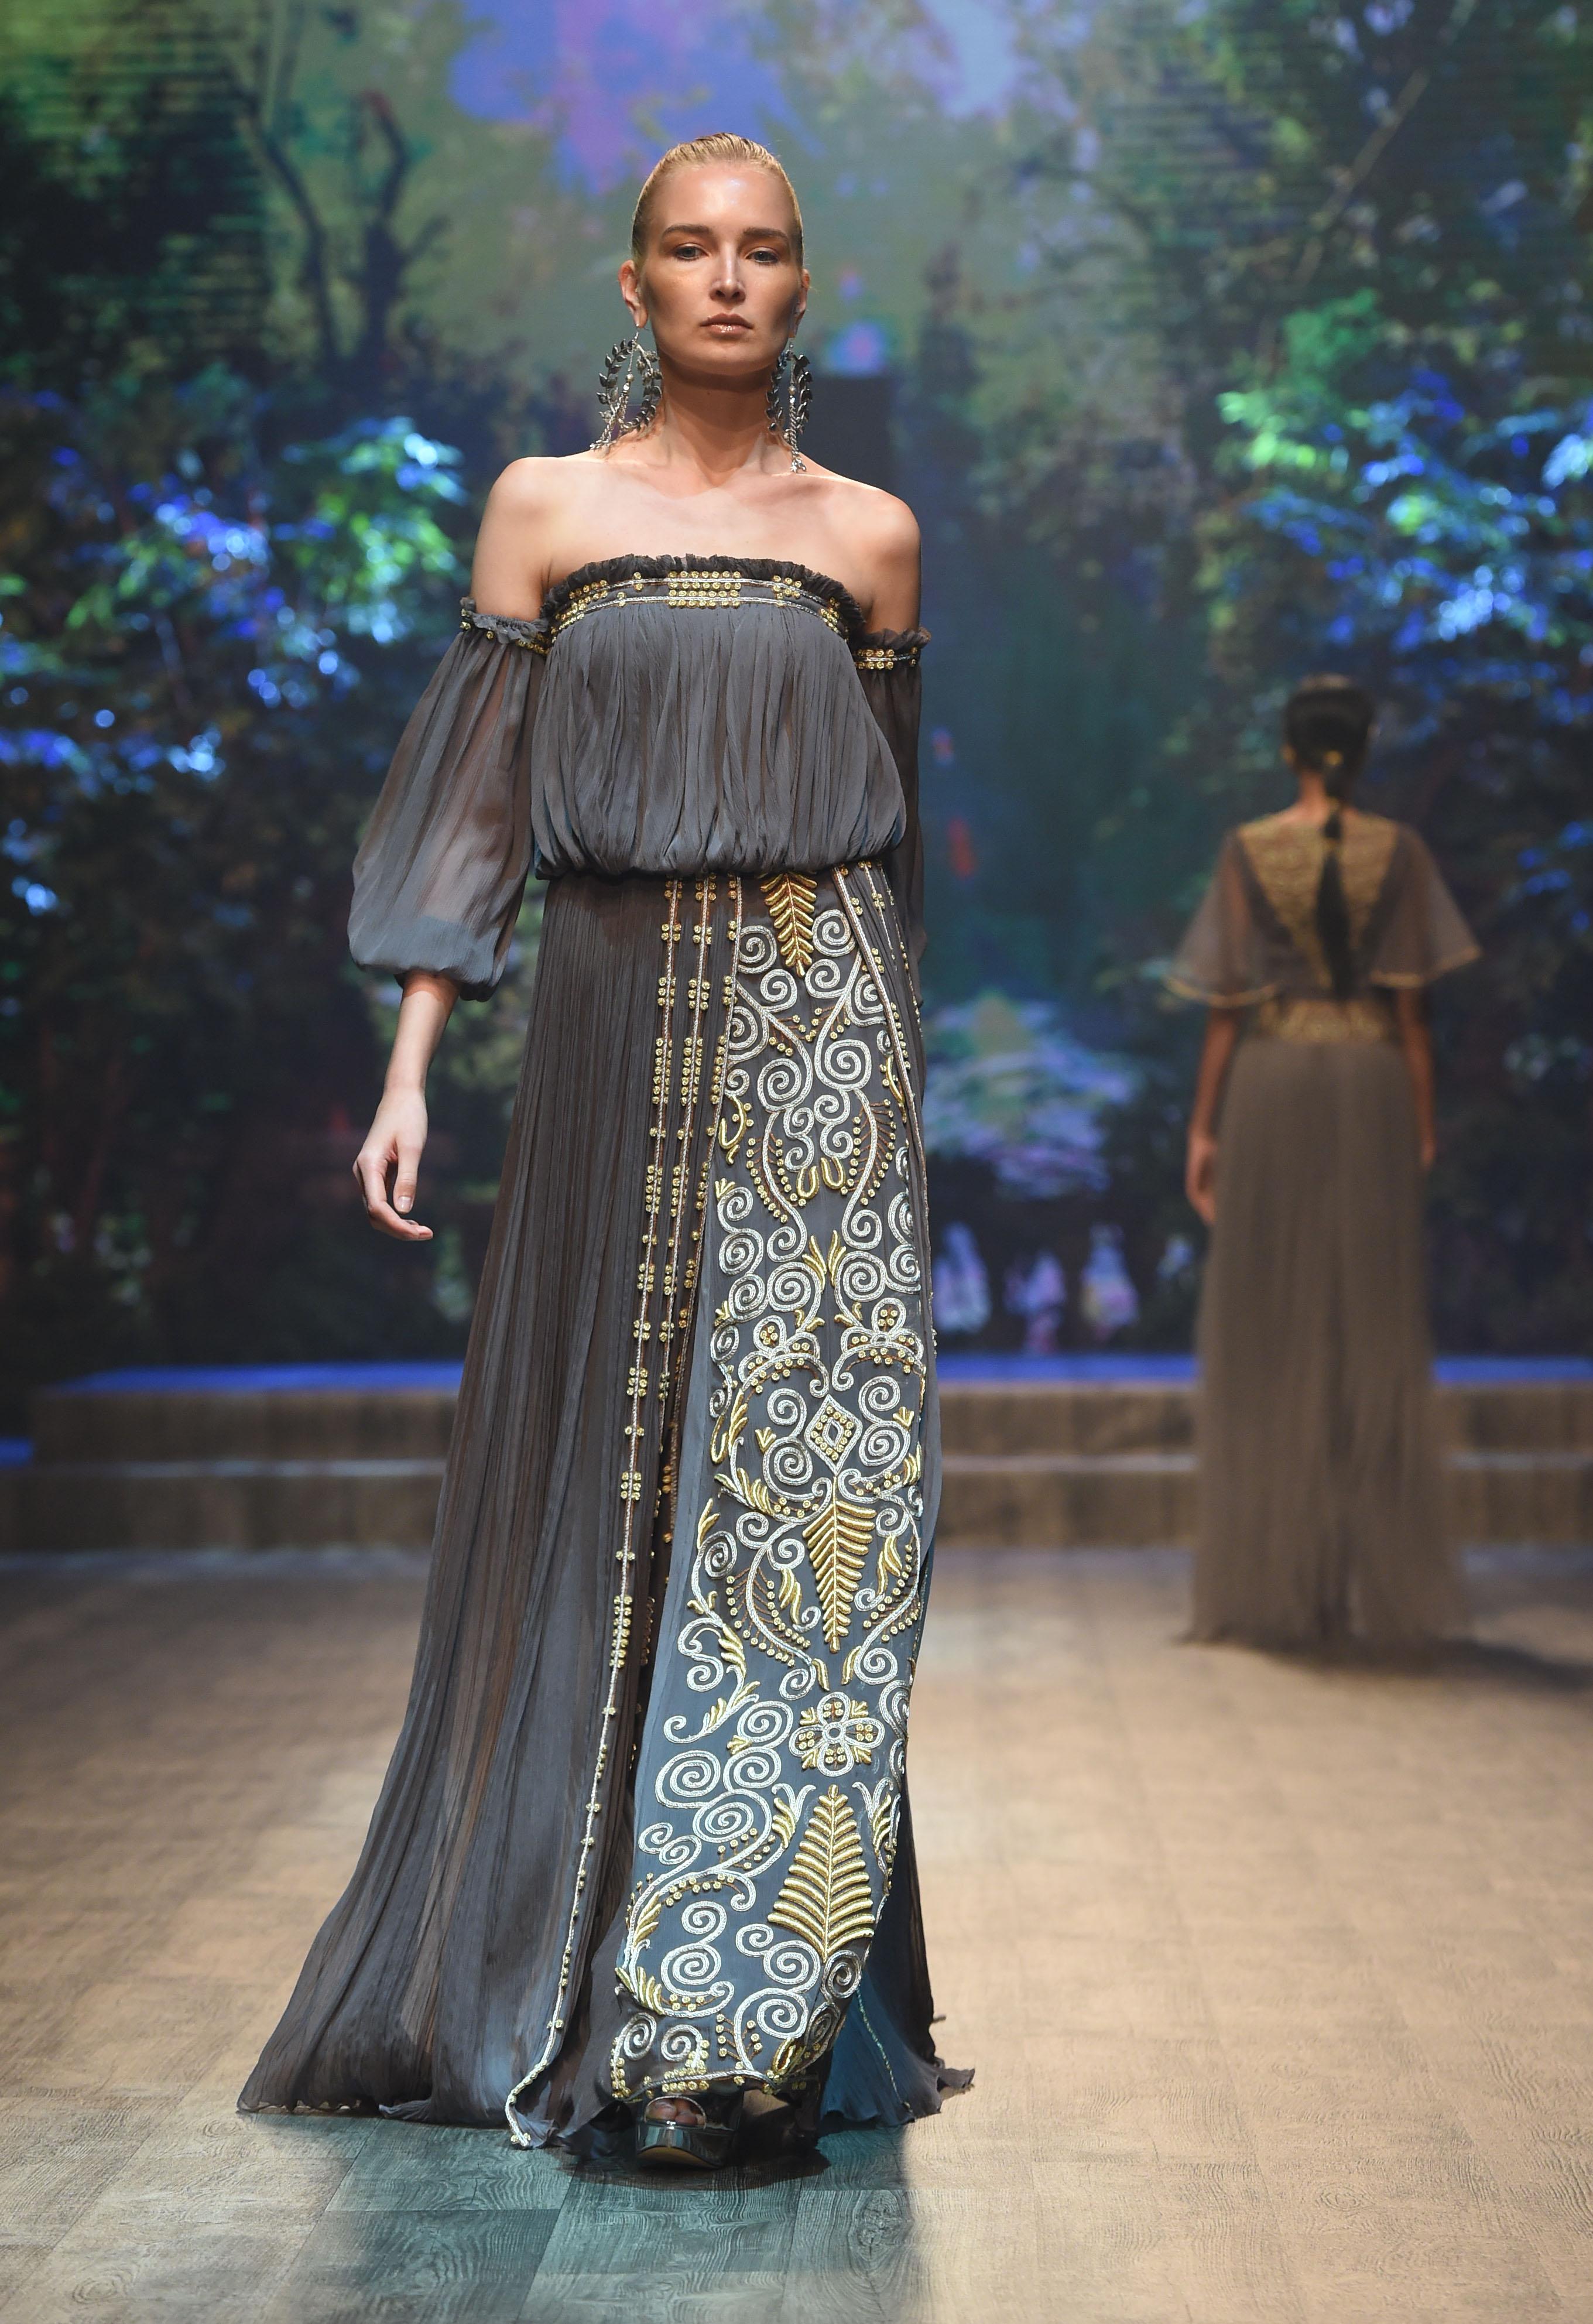 Zareena - Fashion Forward Dubai Season 10, October 2017 - Photography by Stuart C. Wilson, Getty Images